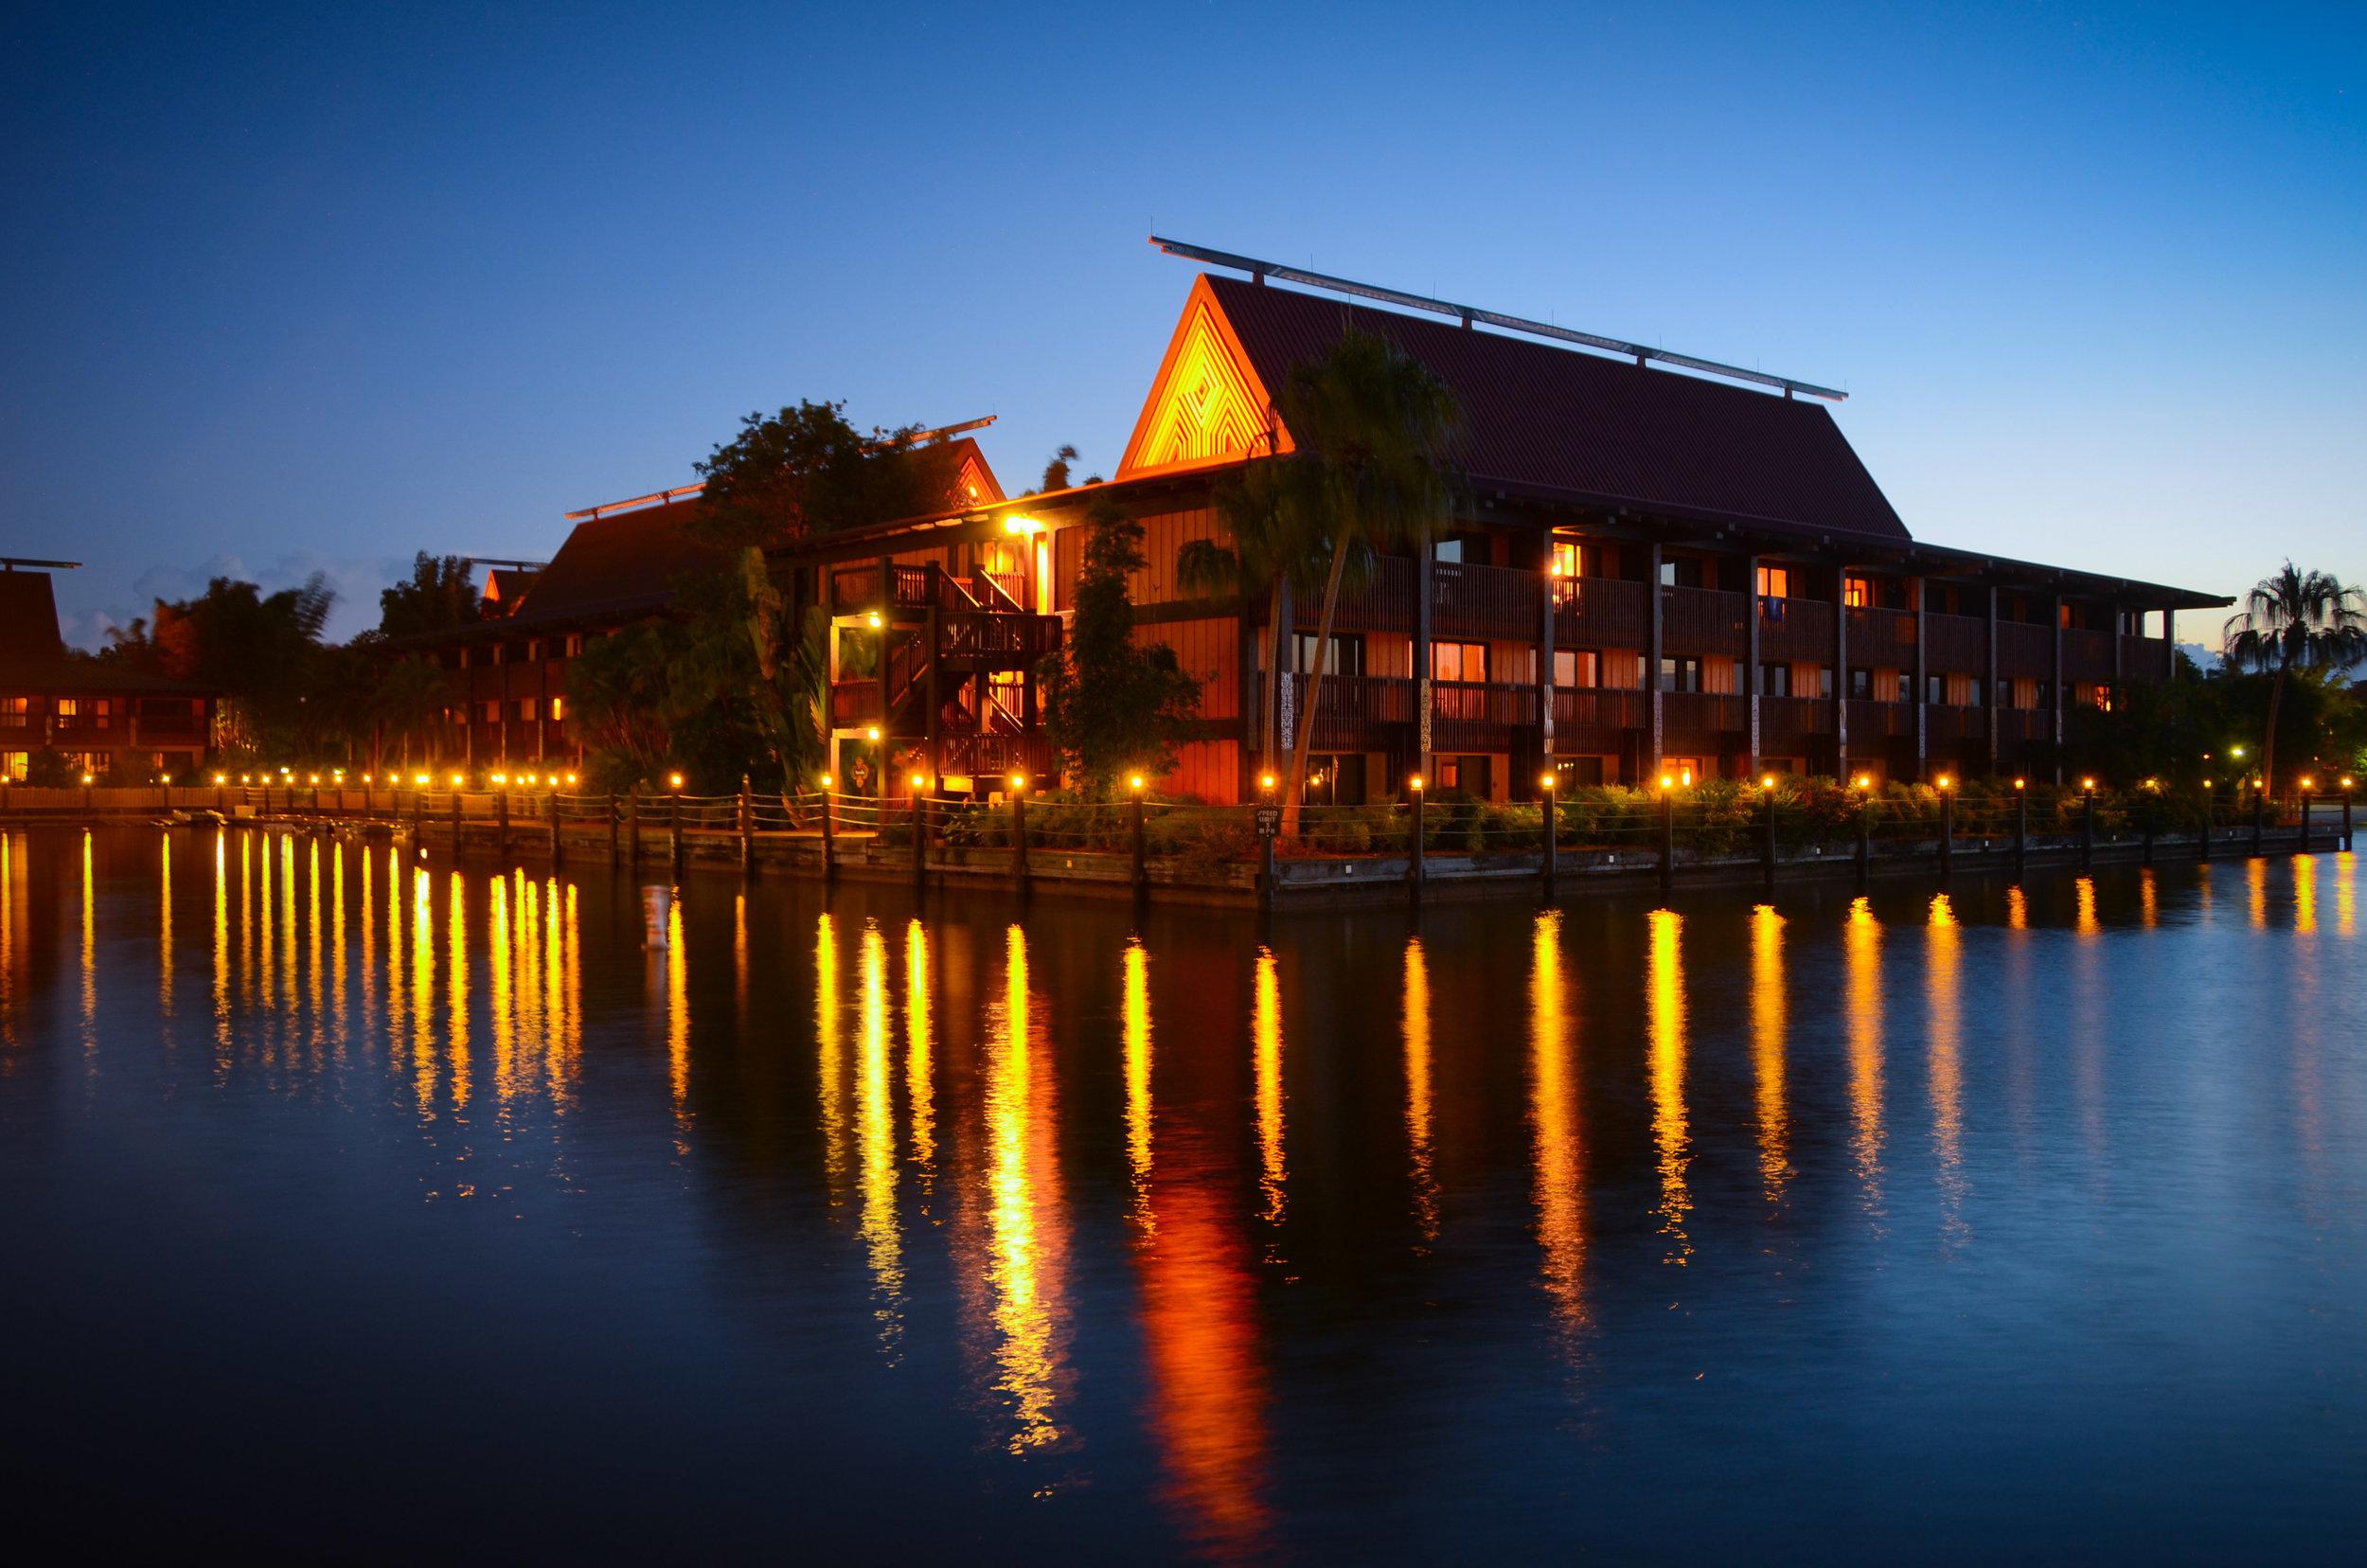 Disney's Polynesian Village Resort